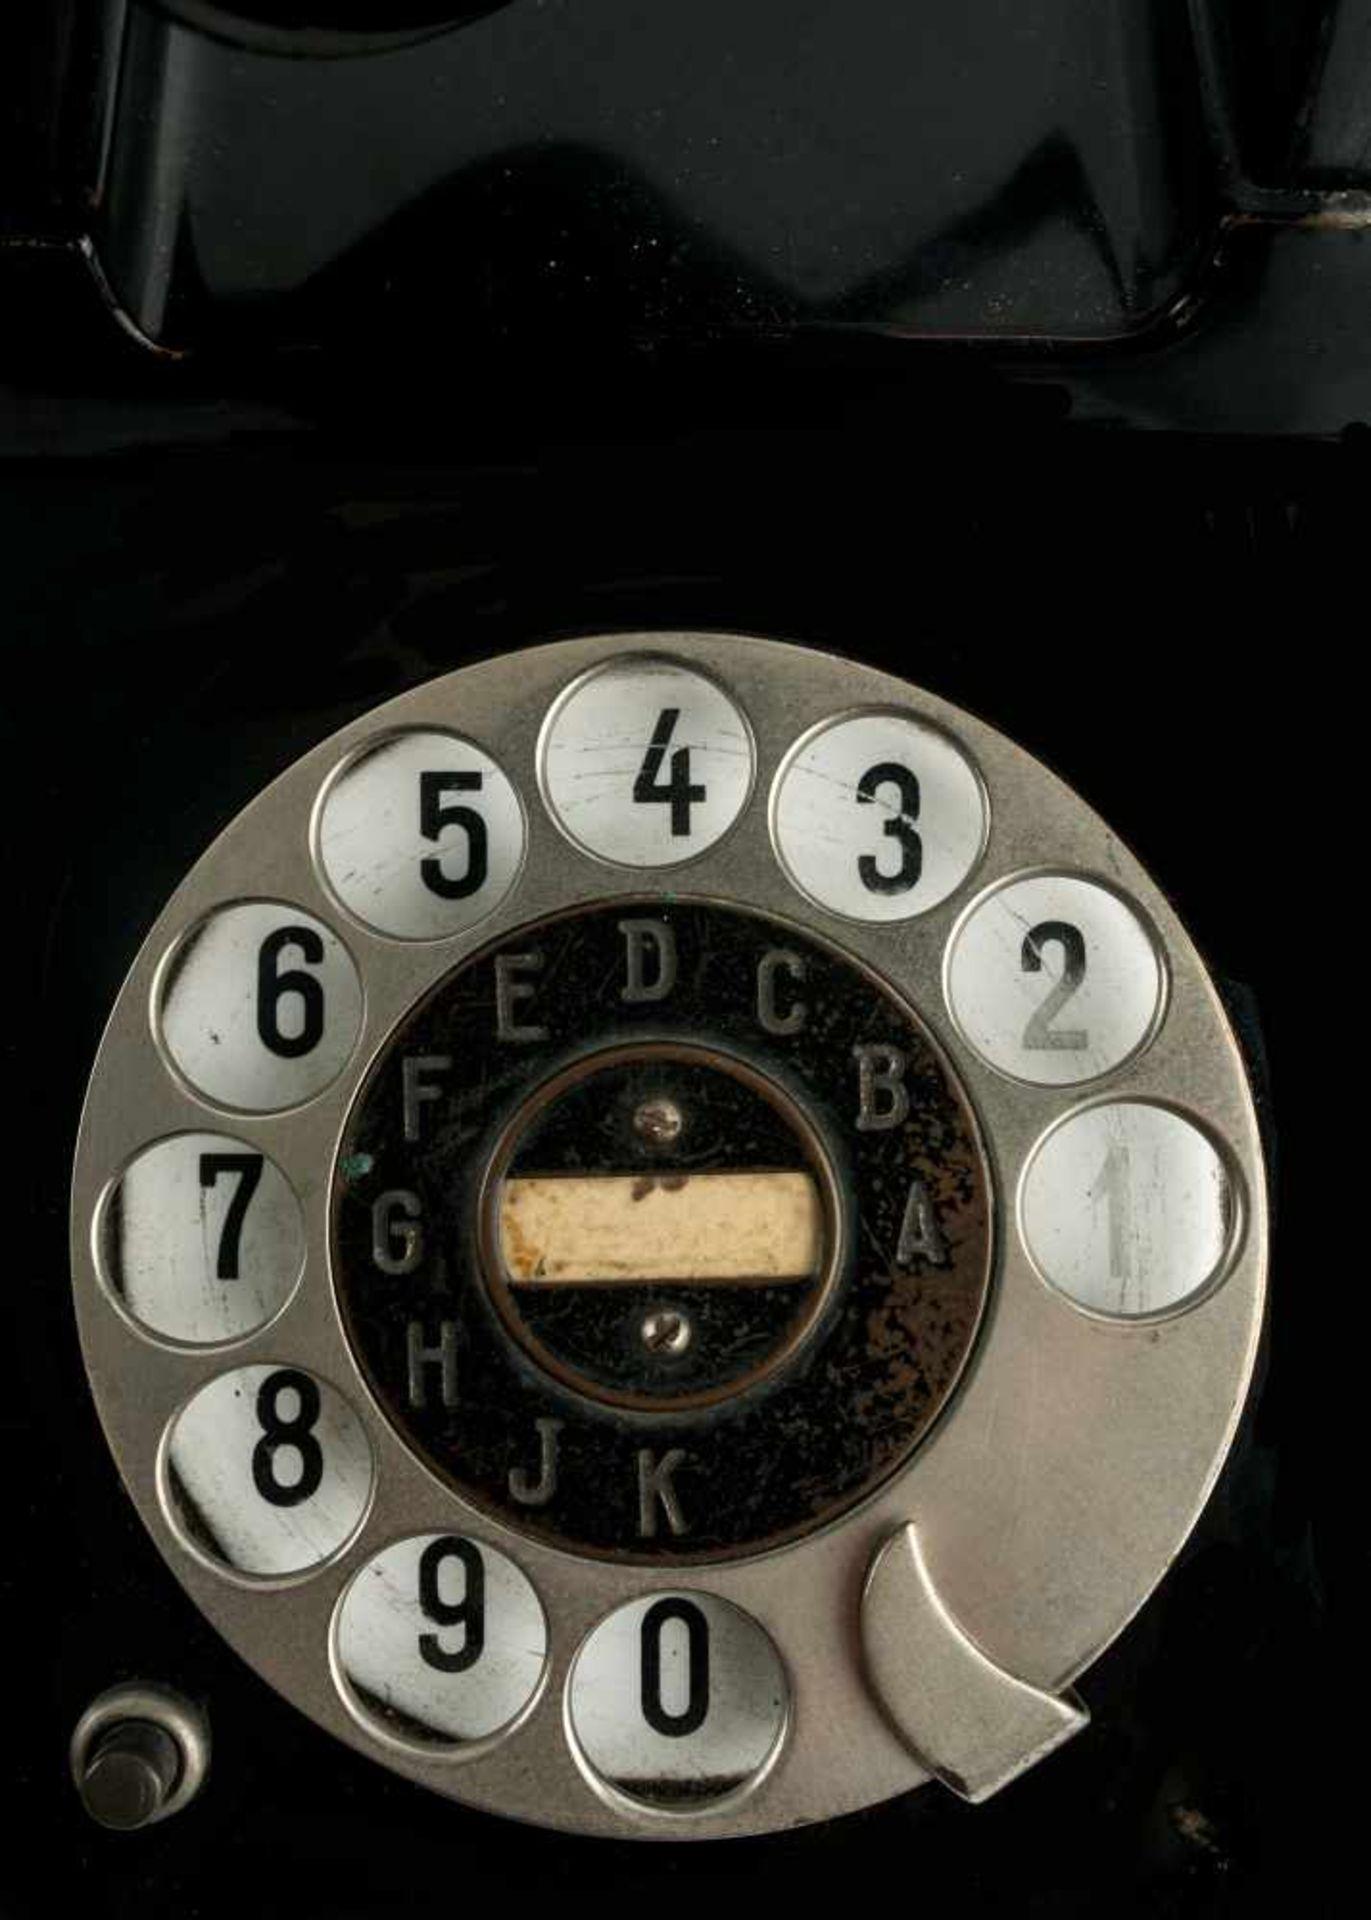 Los 14 - Bauhaus Dessau 'Bauhaus'-Telefon, 1929 H. 13,2 x 11,2 x 15,8 cm; Hörer: L. 24,8 cm. H. Fuld u.